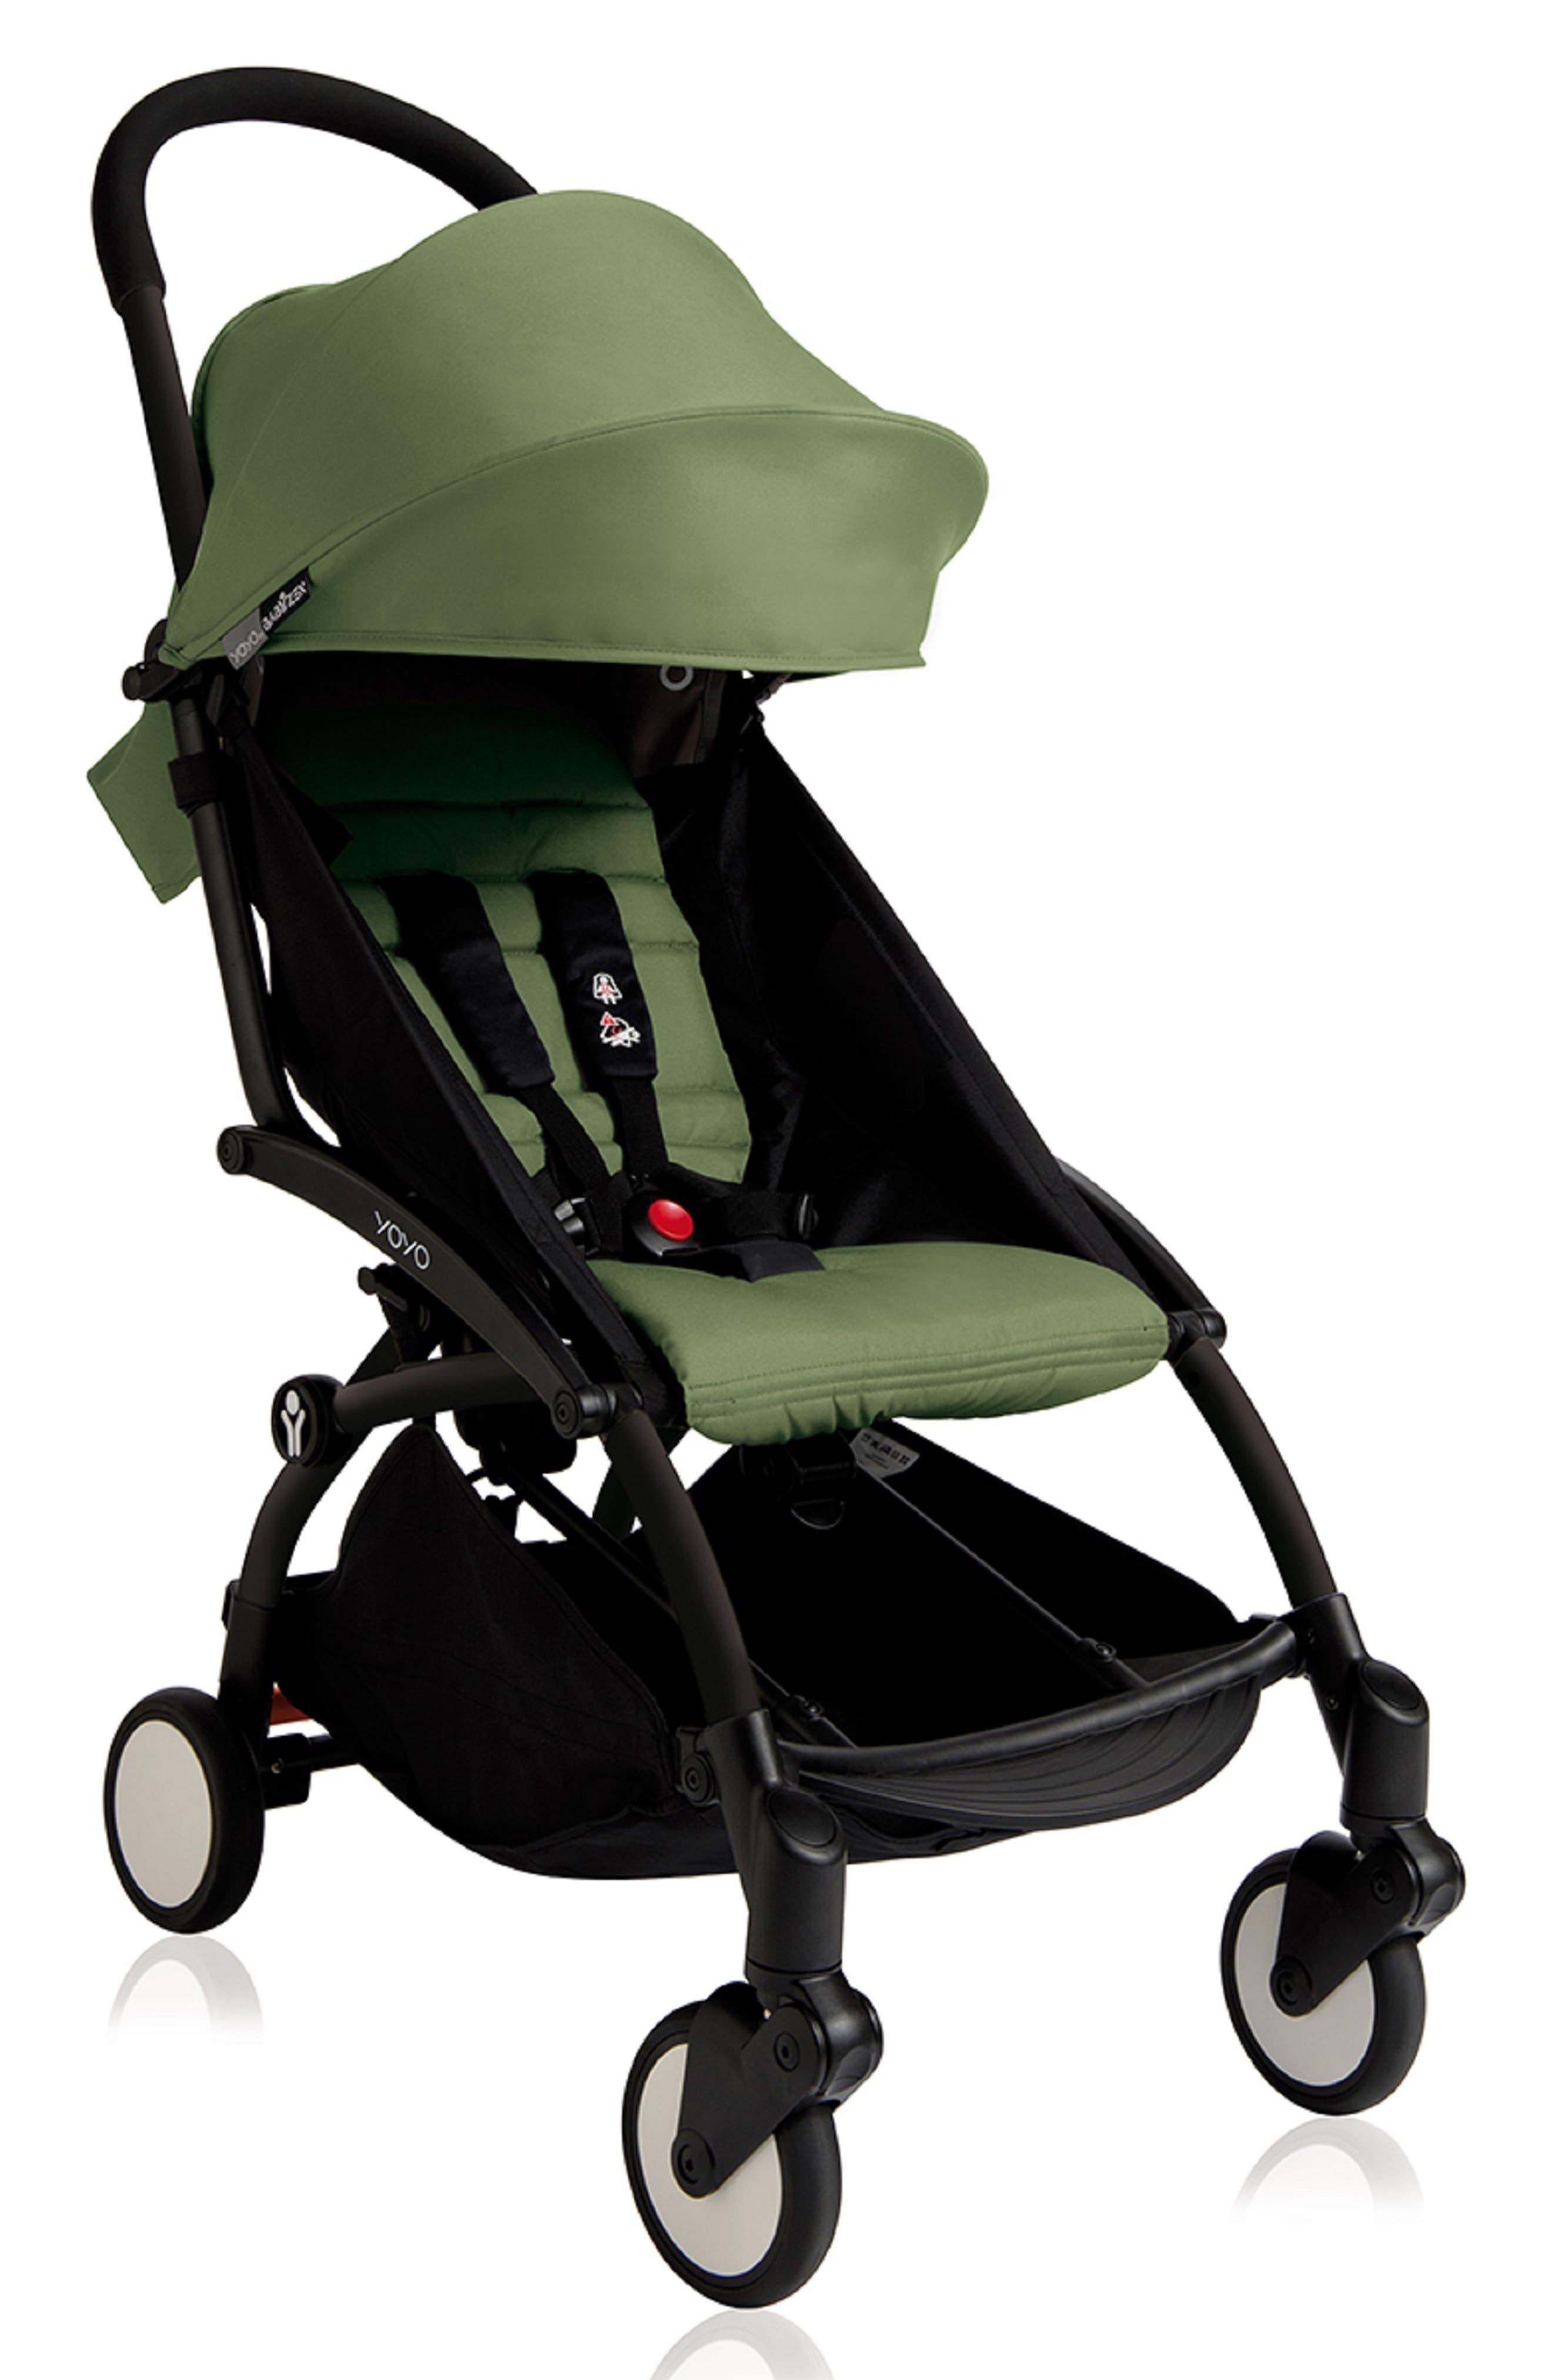 Infant Babyzen(TM) Yoyo Complete Stroller With Travel Bag Black Parasol  New Leg Rest Size One Size  Green